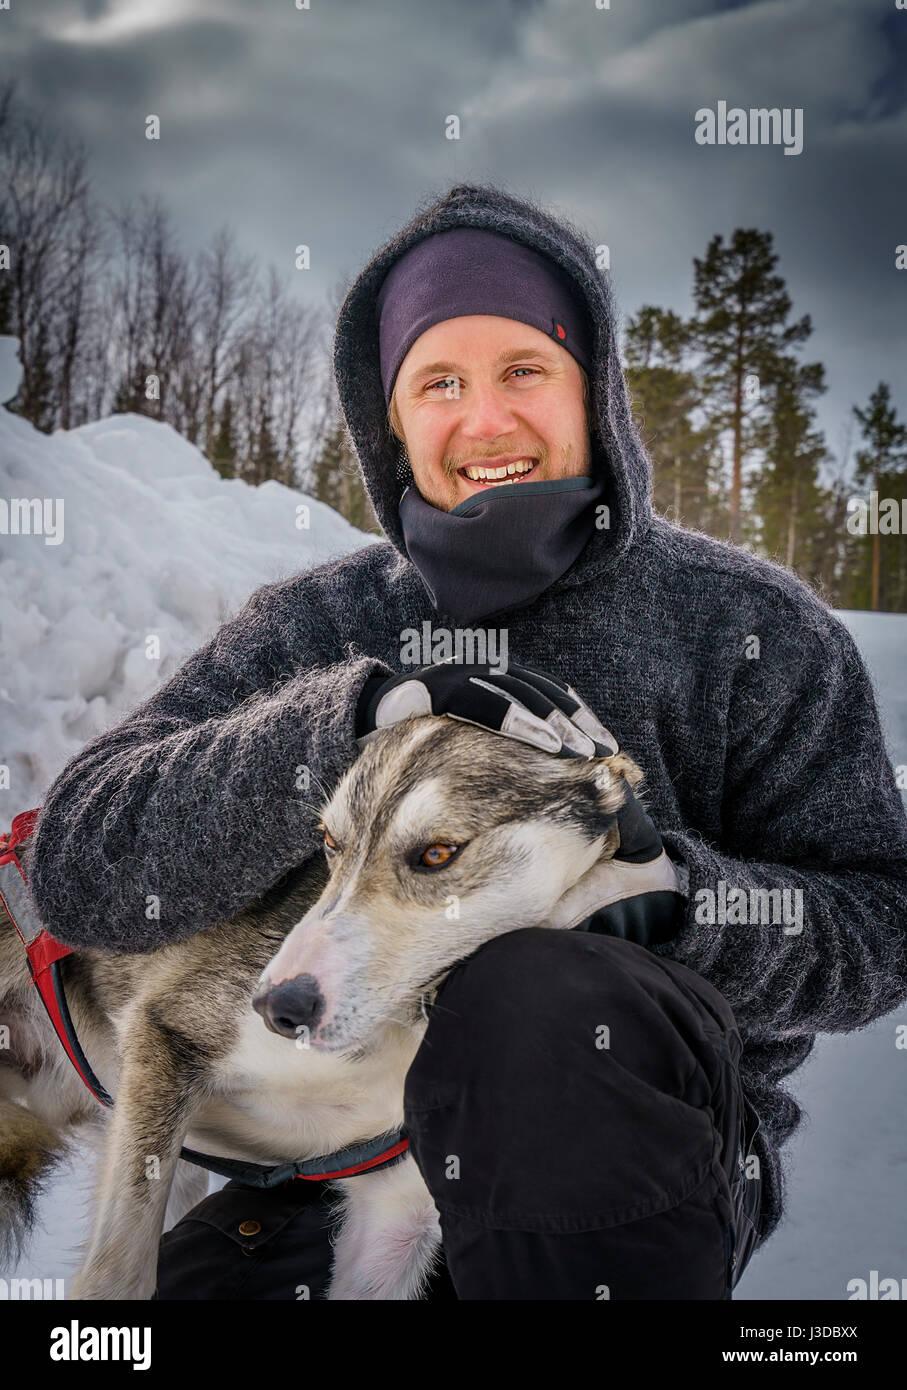 Man with Husky, a sled dog, Swedish Lapland, Sweden - Stock Image